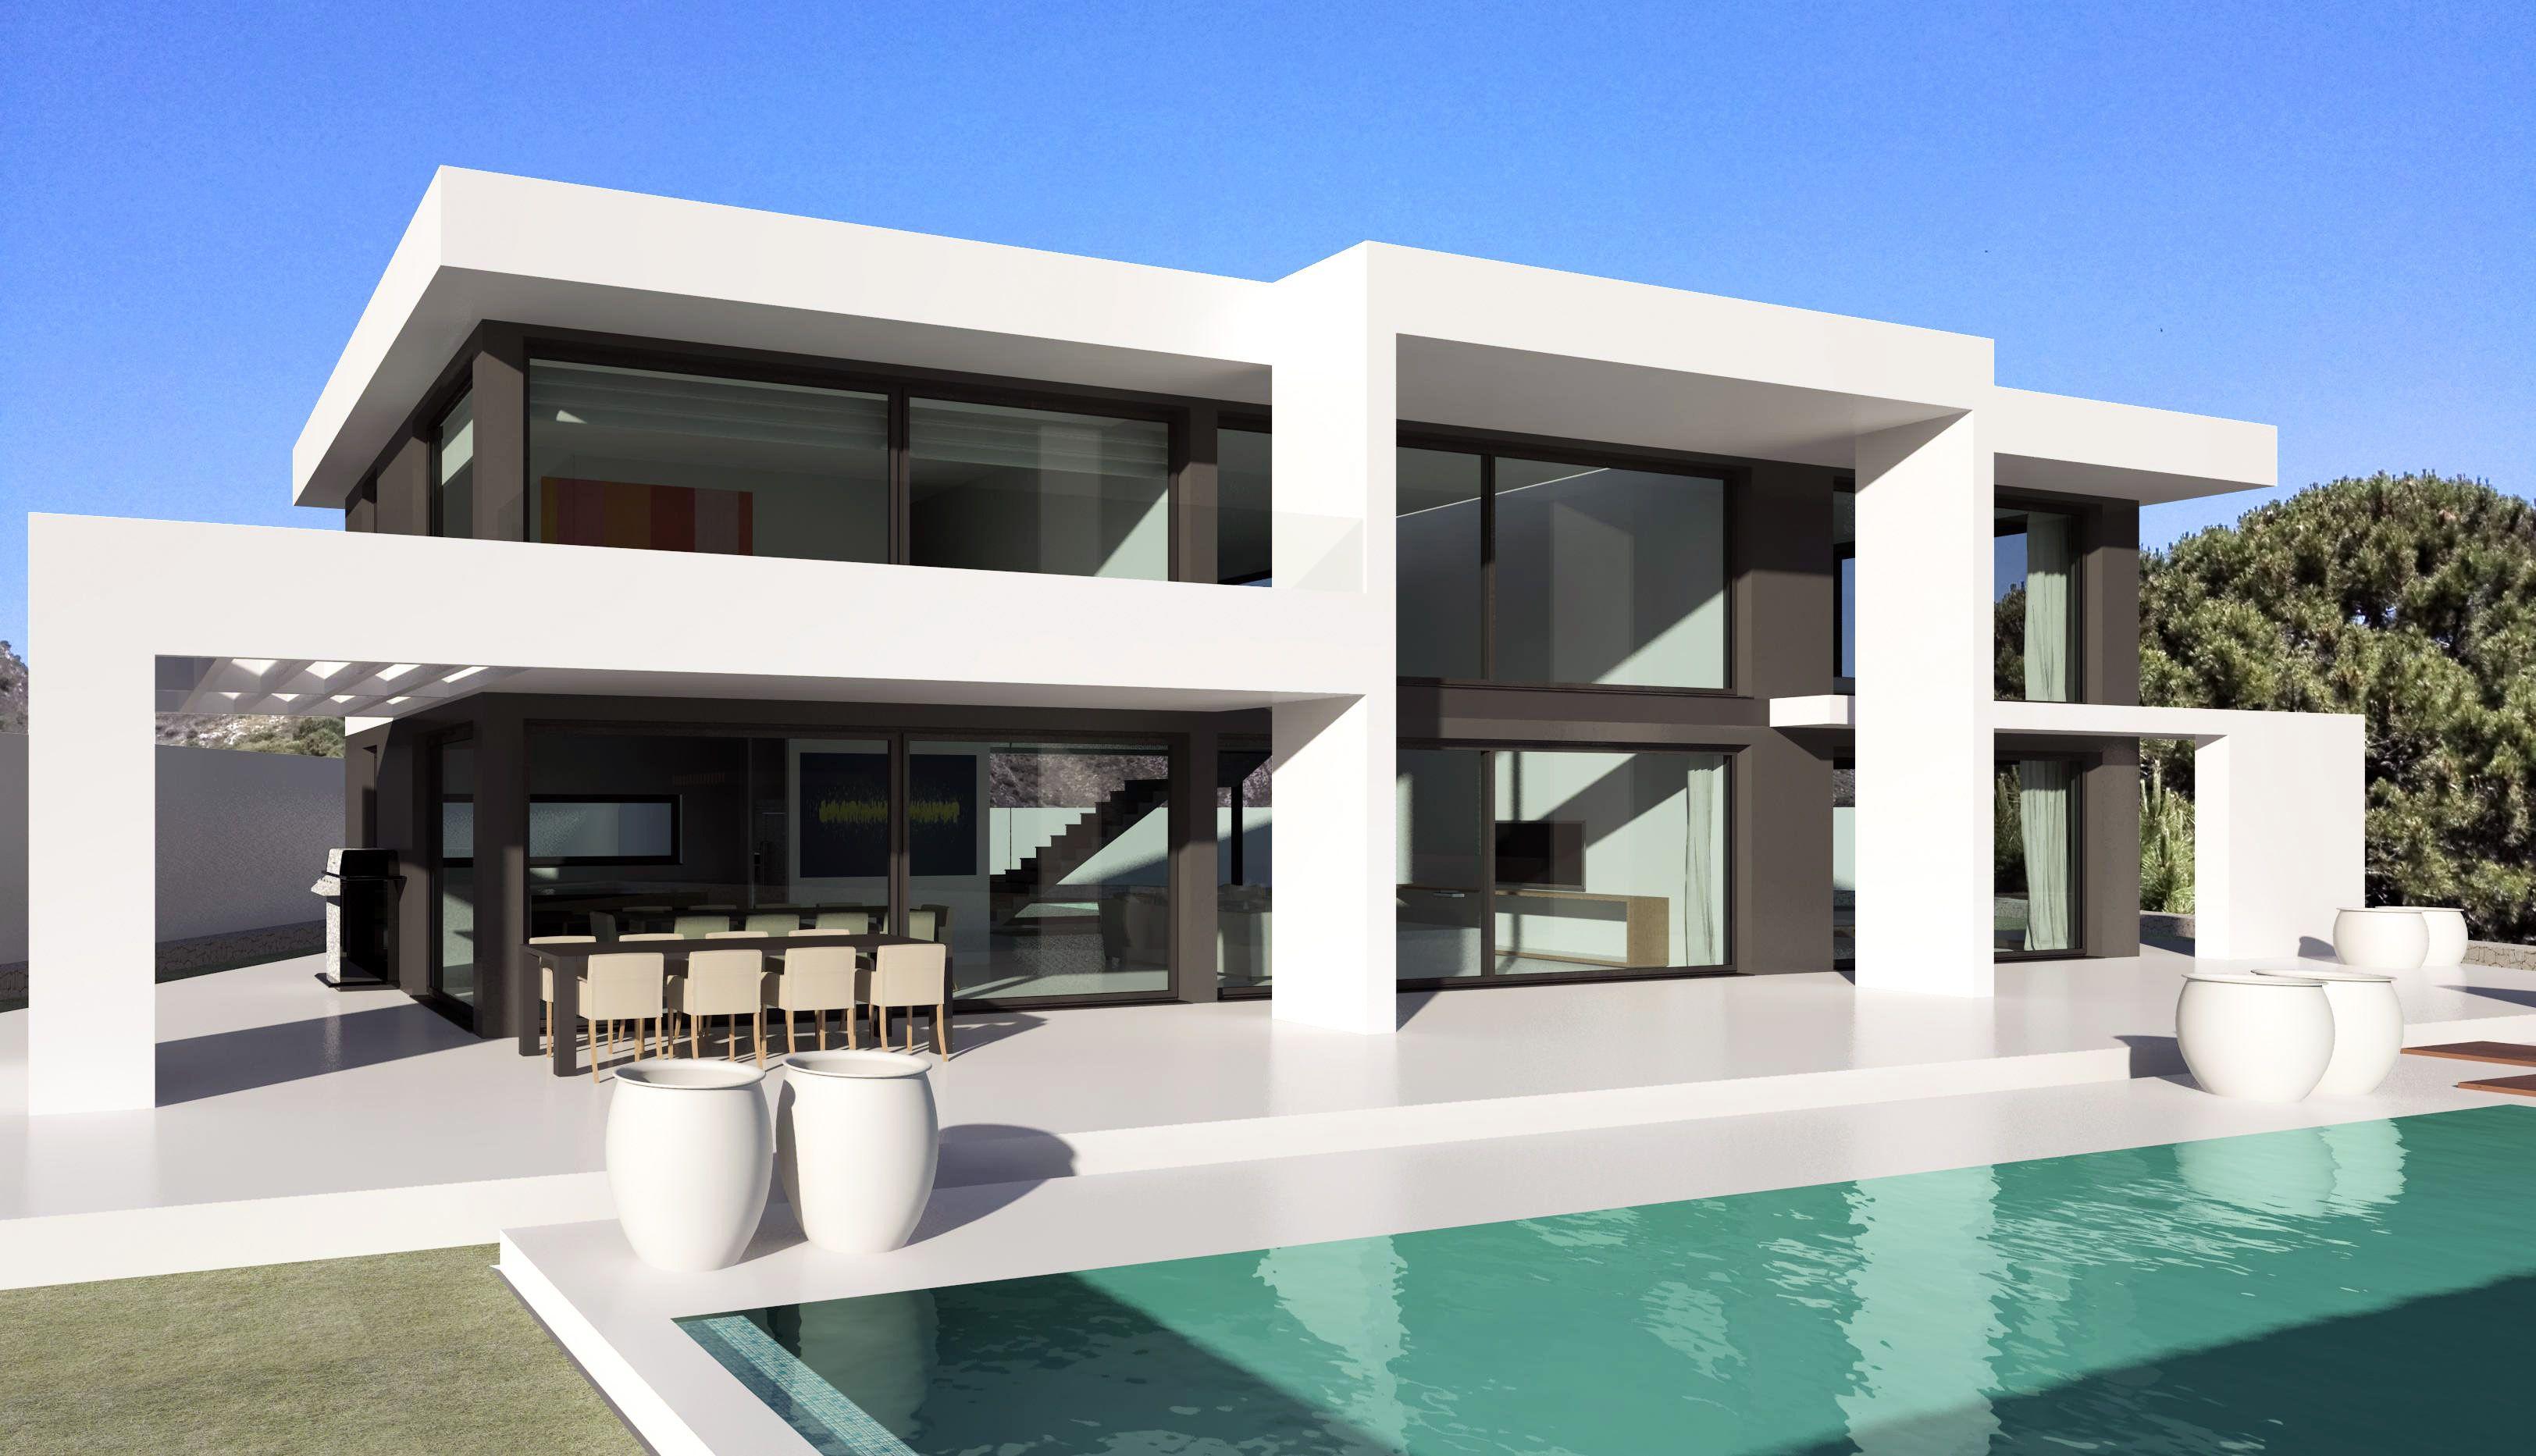 Modern Turnkey Villas in Spain France Portugal  Turnkey Villas  Pinterest  France